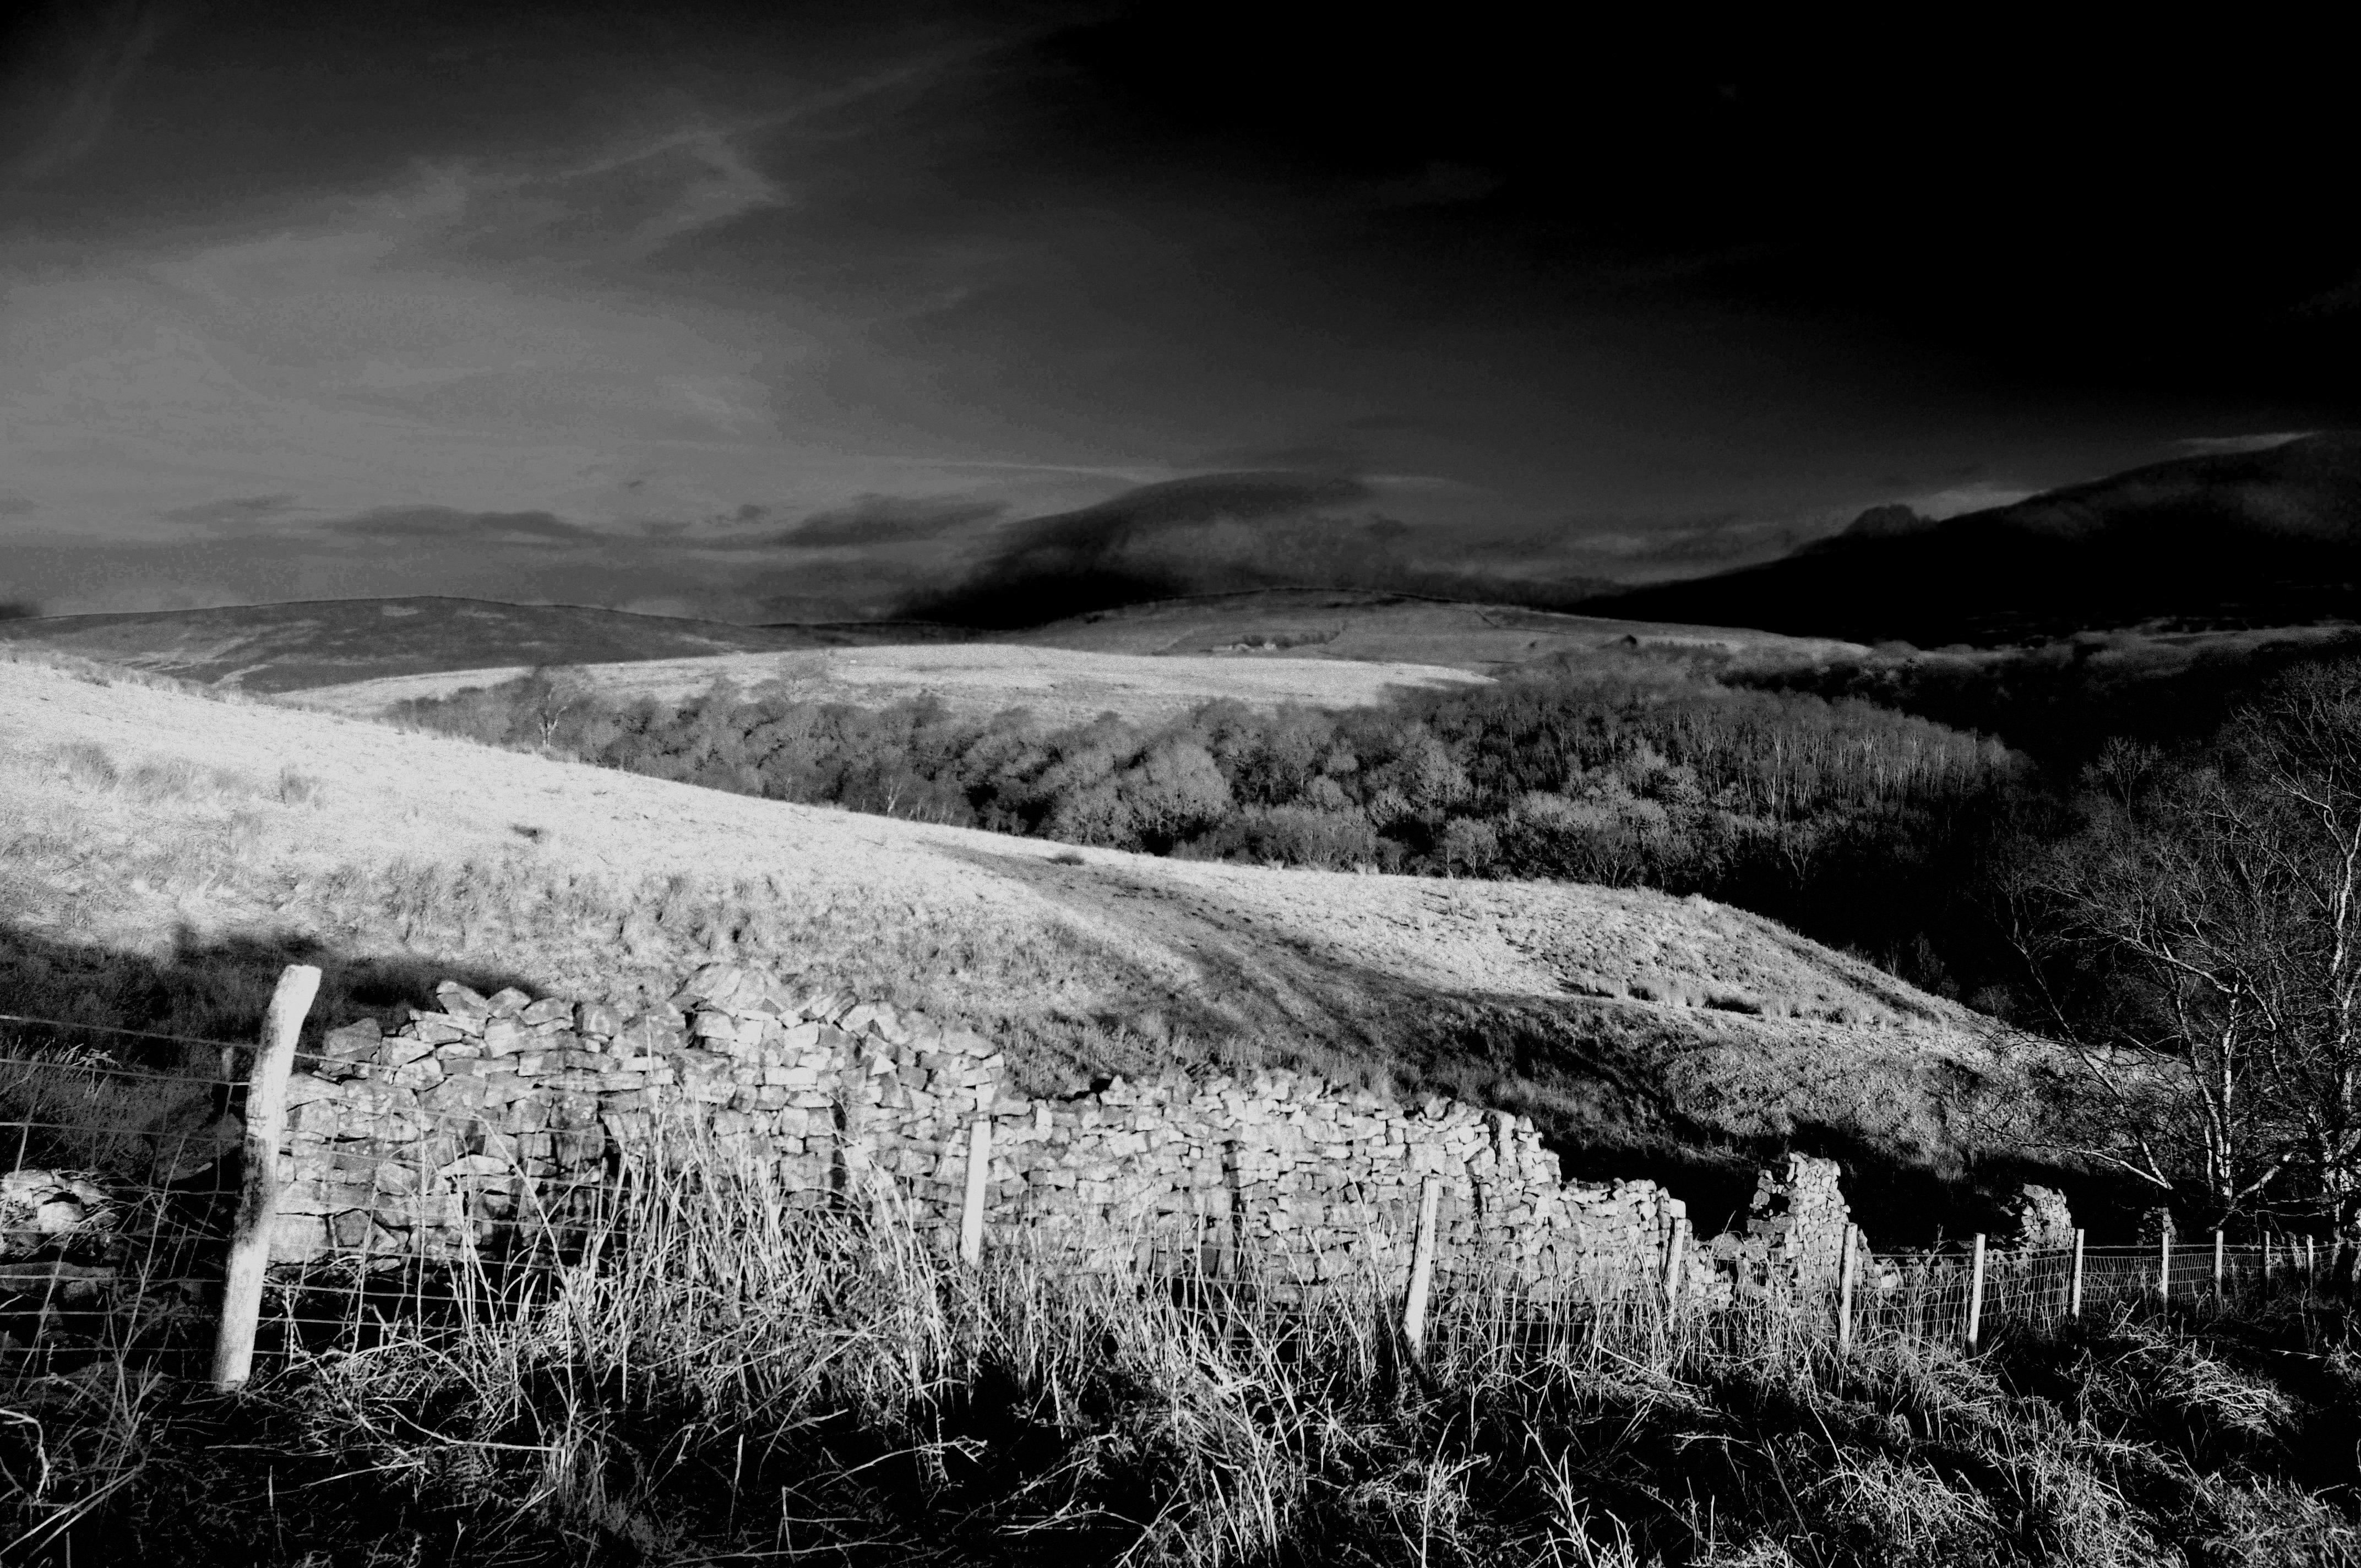 Bowland Fells, Lancashire, England.